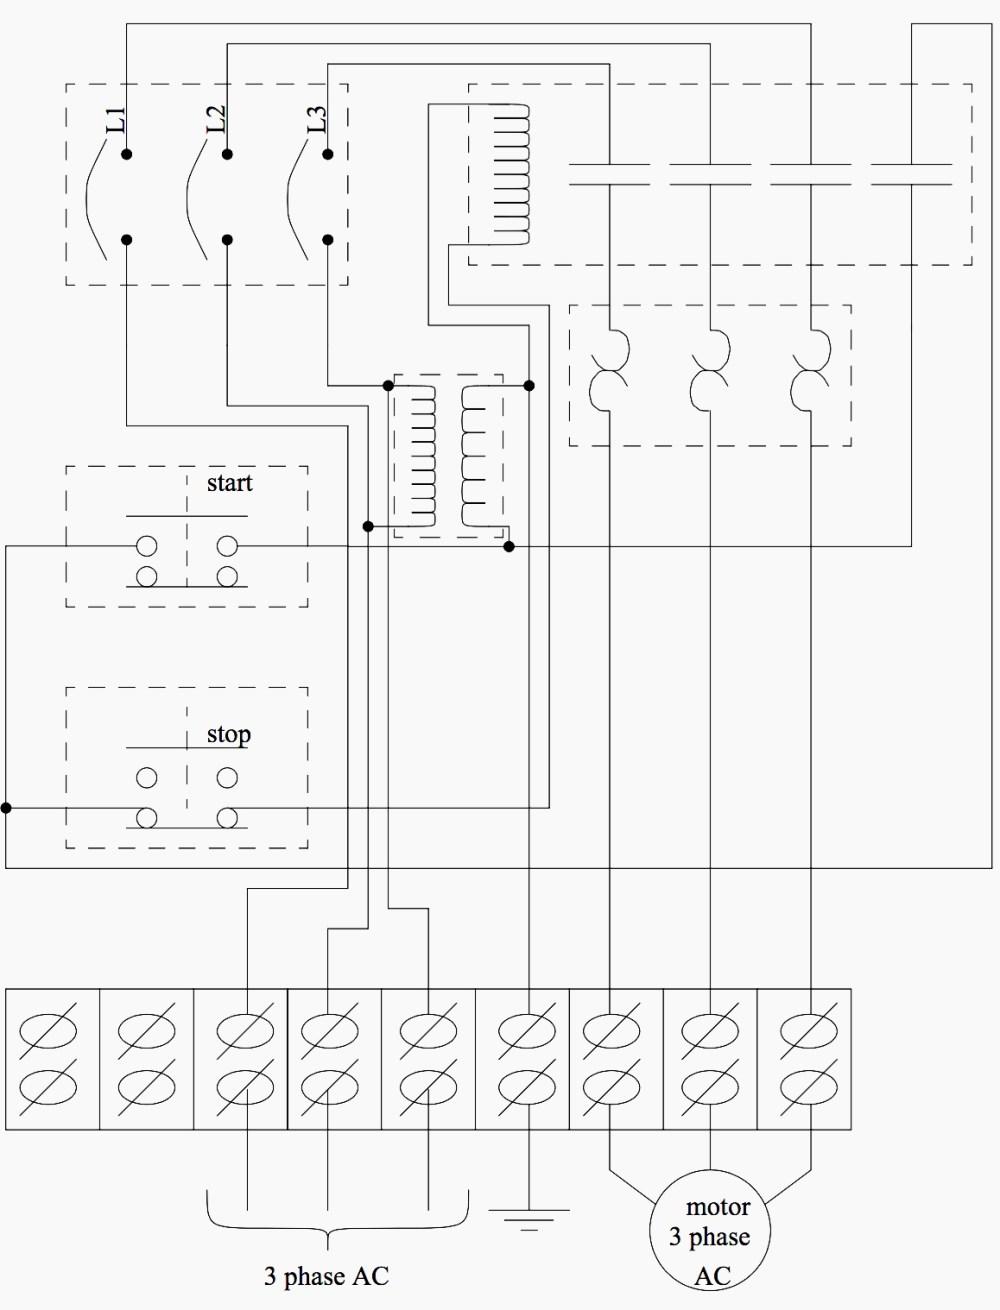 medium resolution of circuit diagram of plc control pump motor controlcircuit circuit electrical circuit diagram plc new wiring diagram